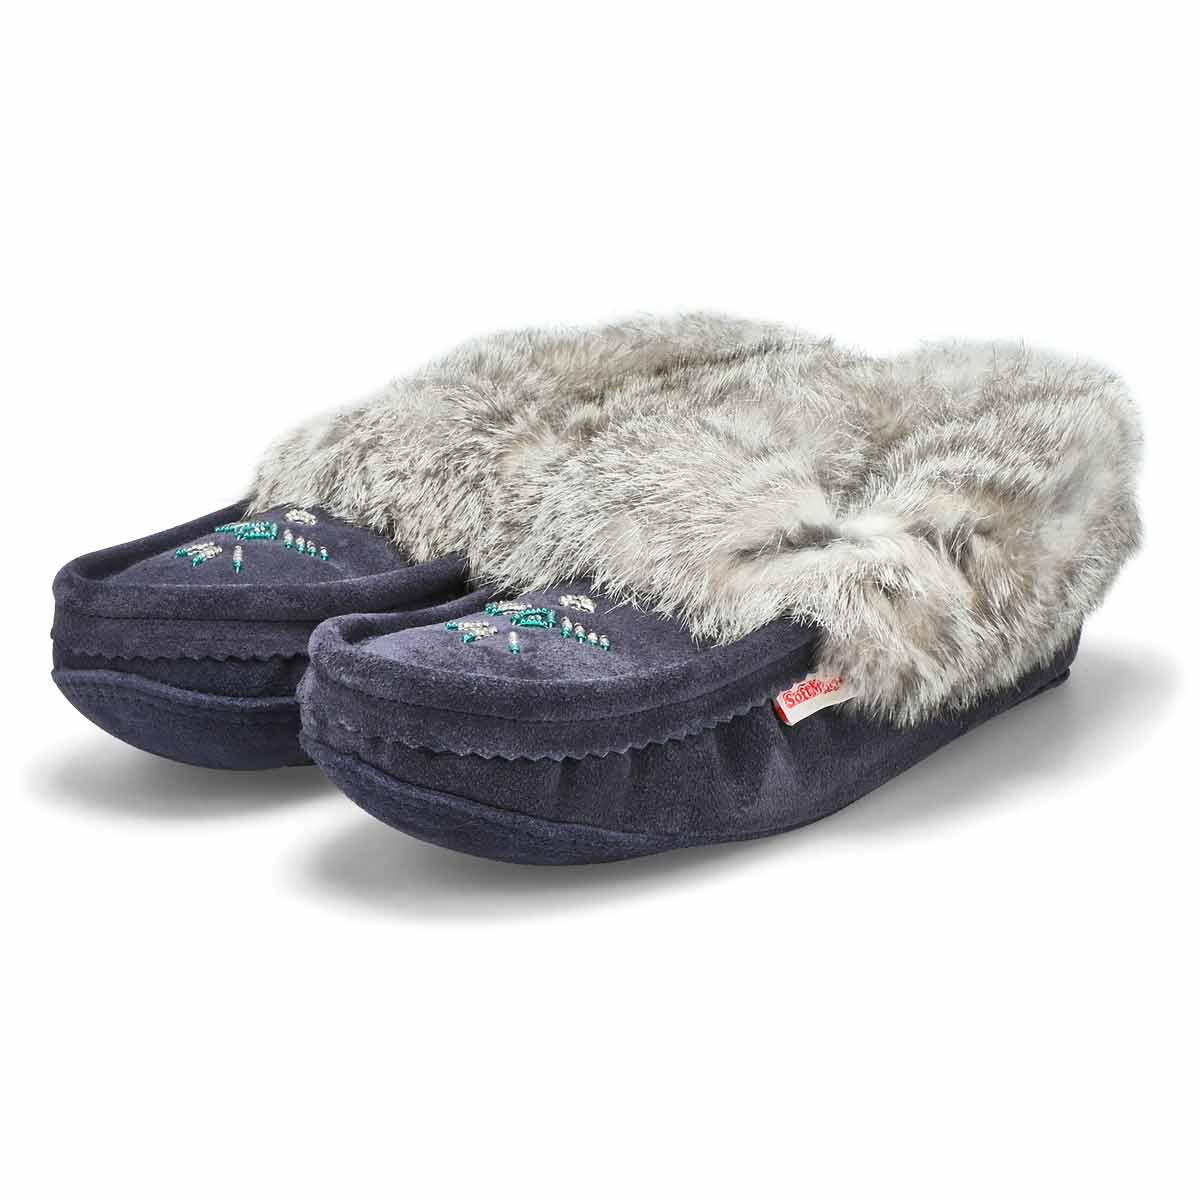 Lds navy rabbit fur moccasin